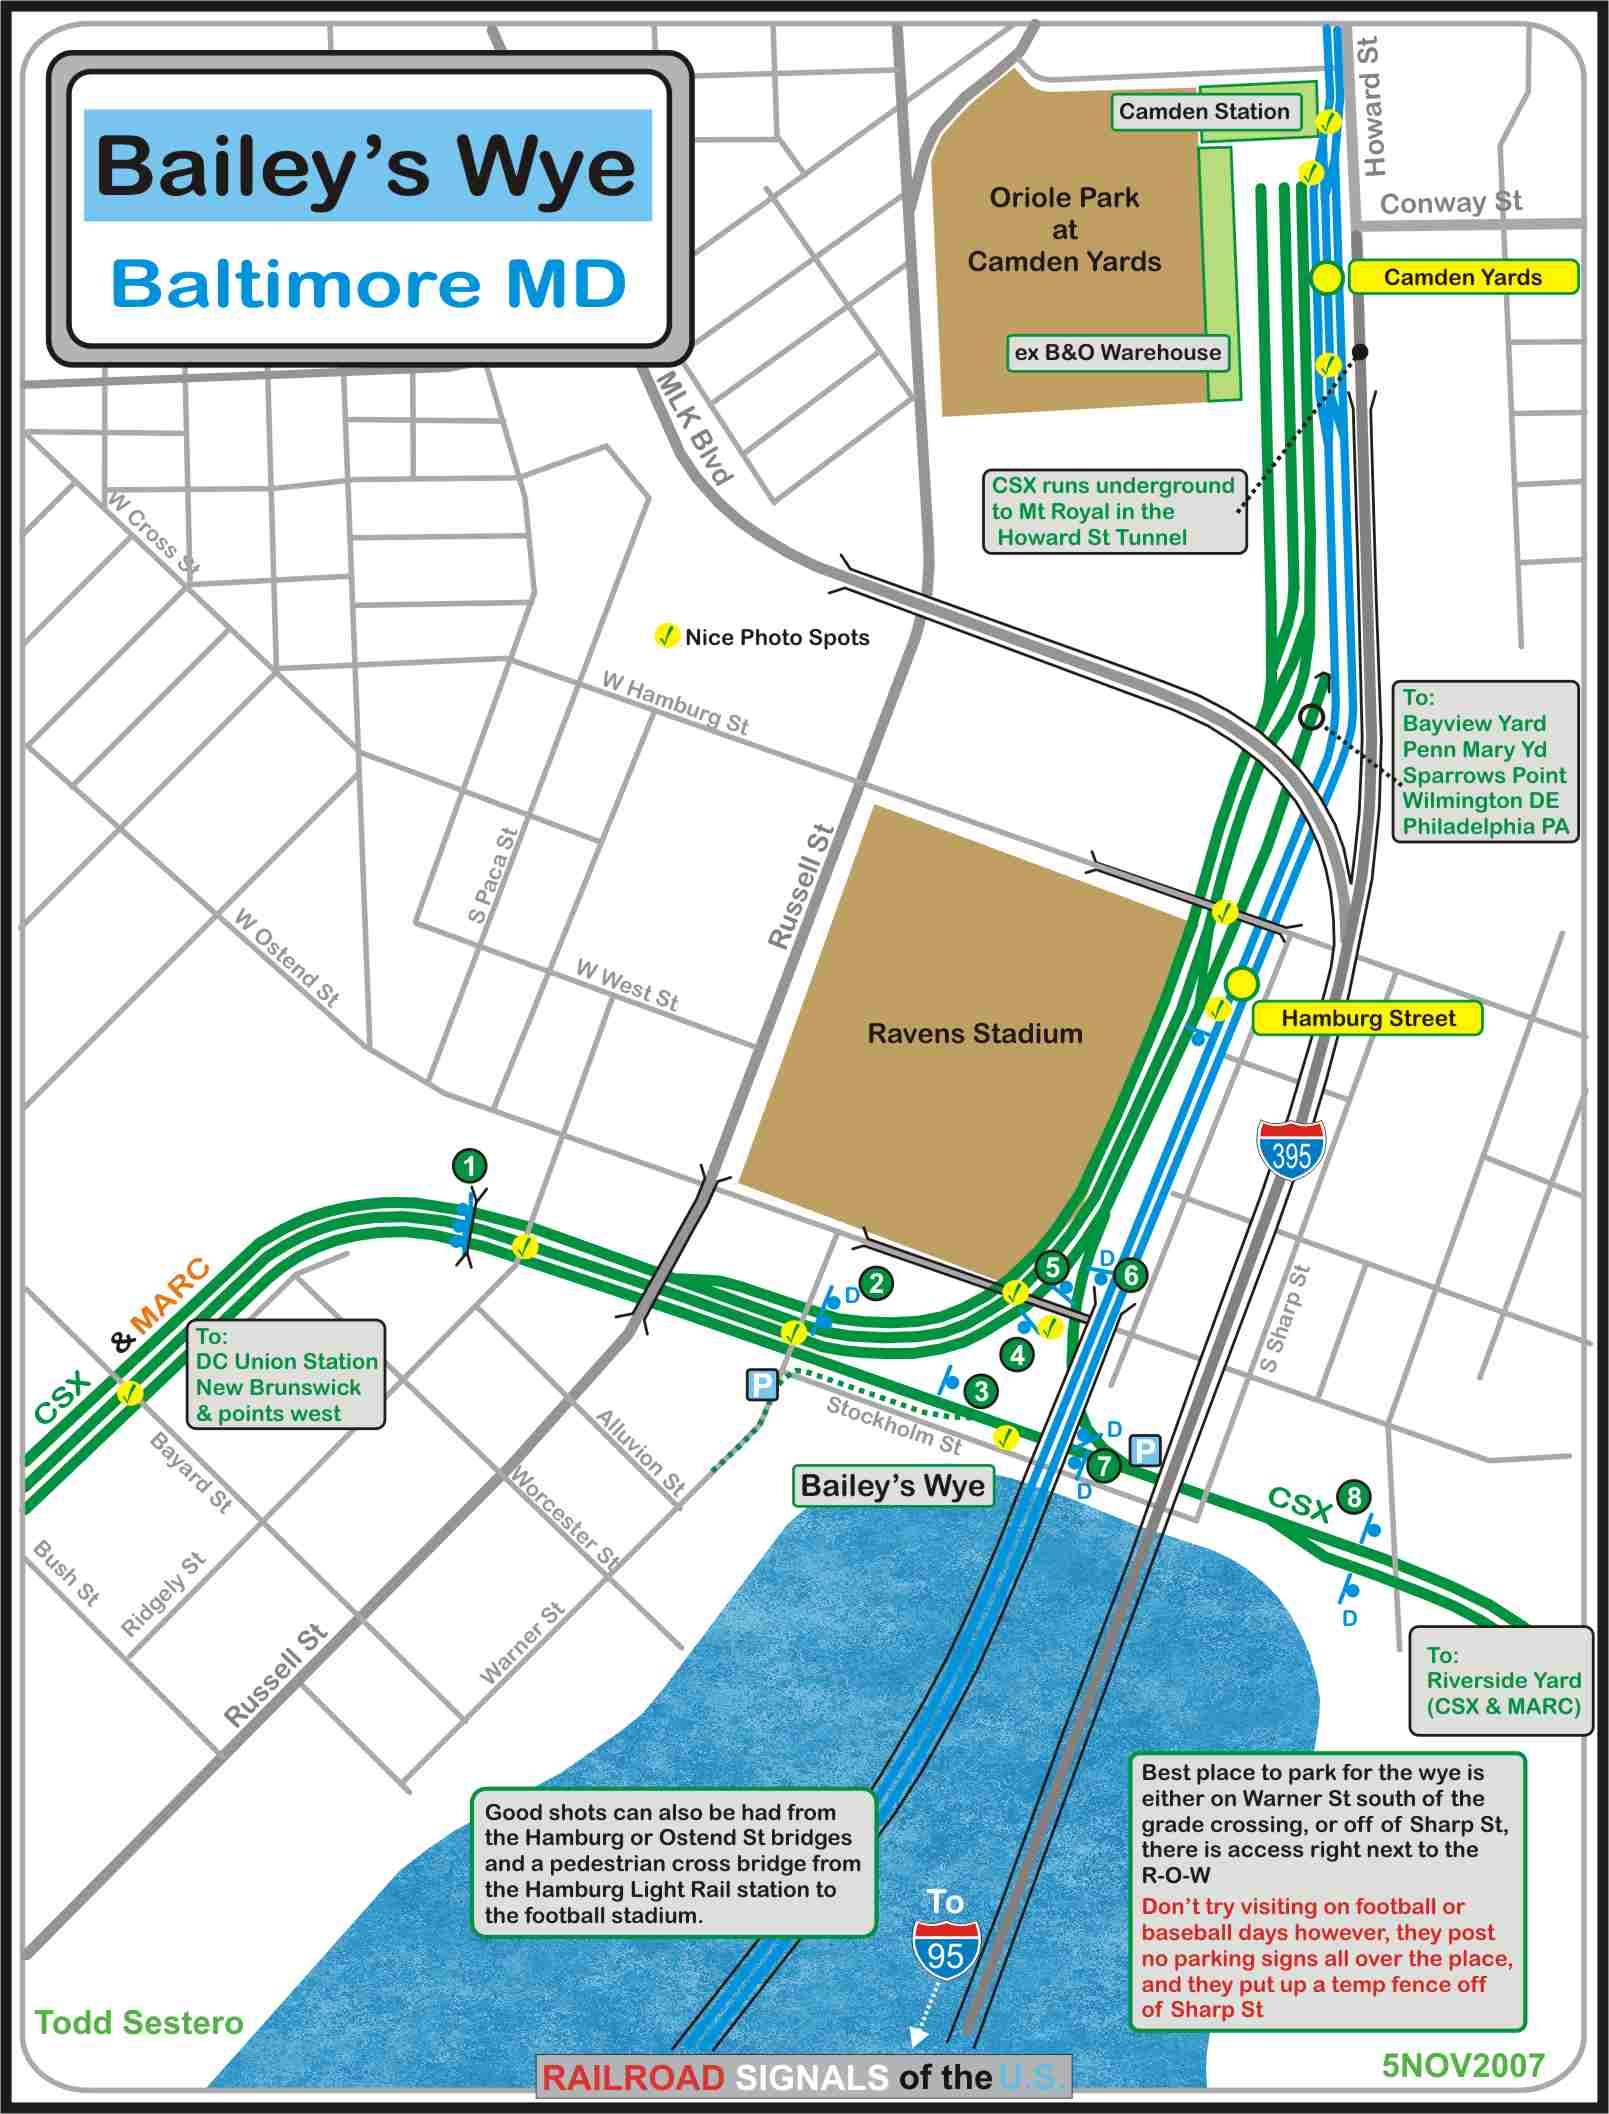 Baileys Wye - Baltimore MD Railfan Guide